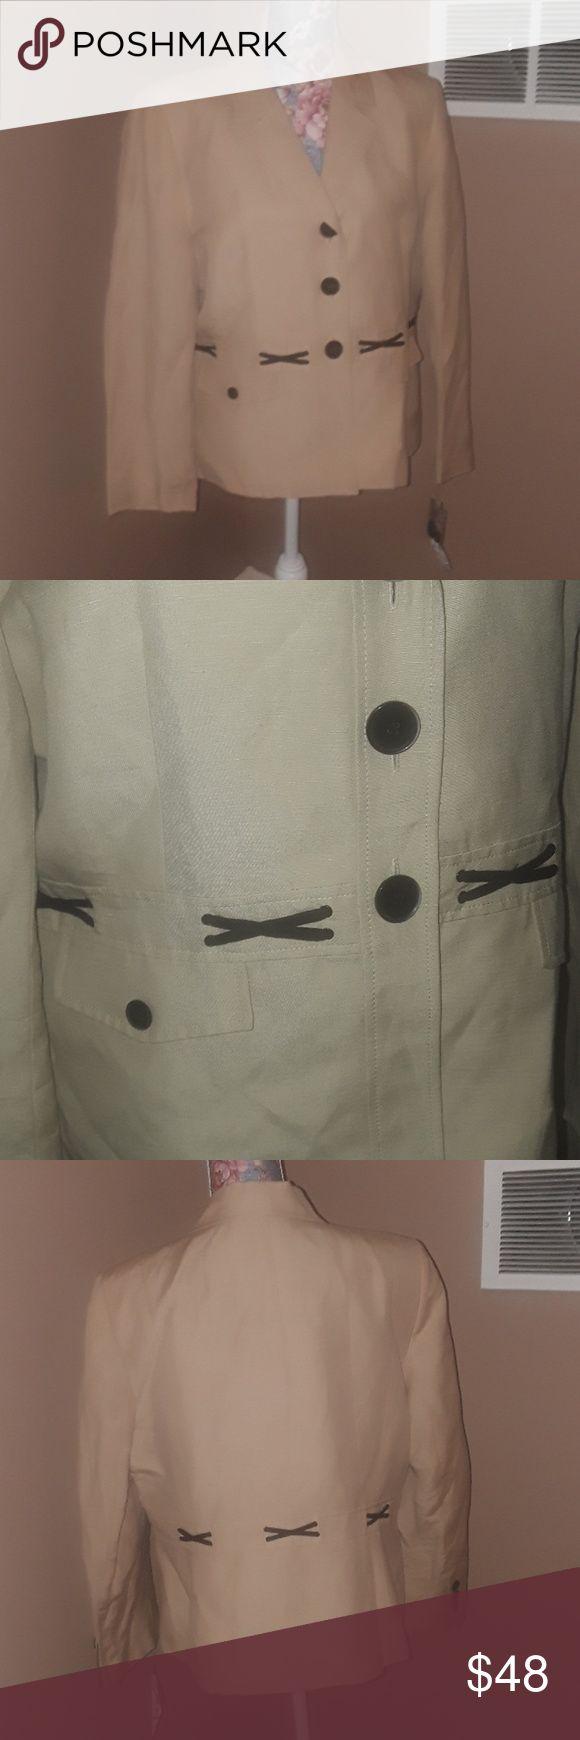 Kasper Petite Suit Jacket 16P NWT Kasper Petite Blazer/jacket only New with tags 16p 55% linen 45% rayon Lining is 100% polyester Kasper Jackets & Coats Blazers